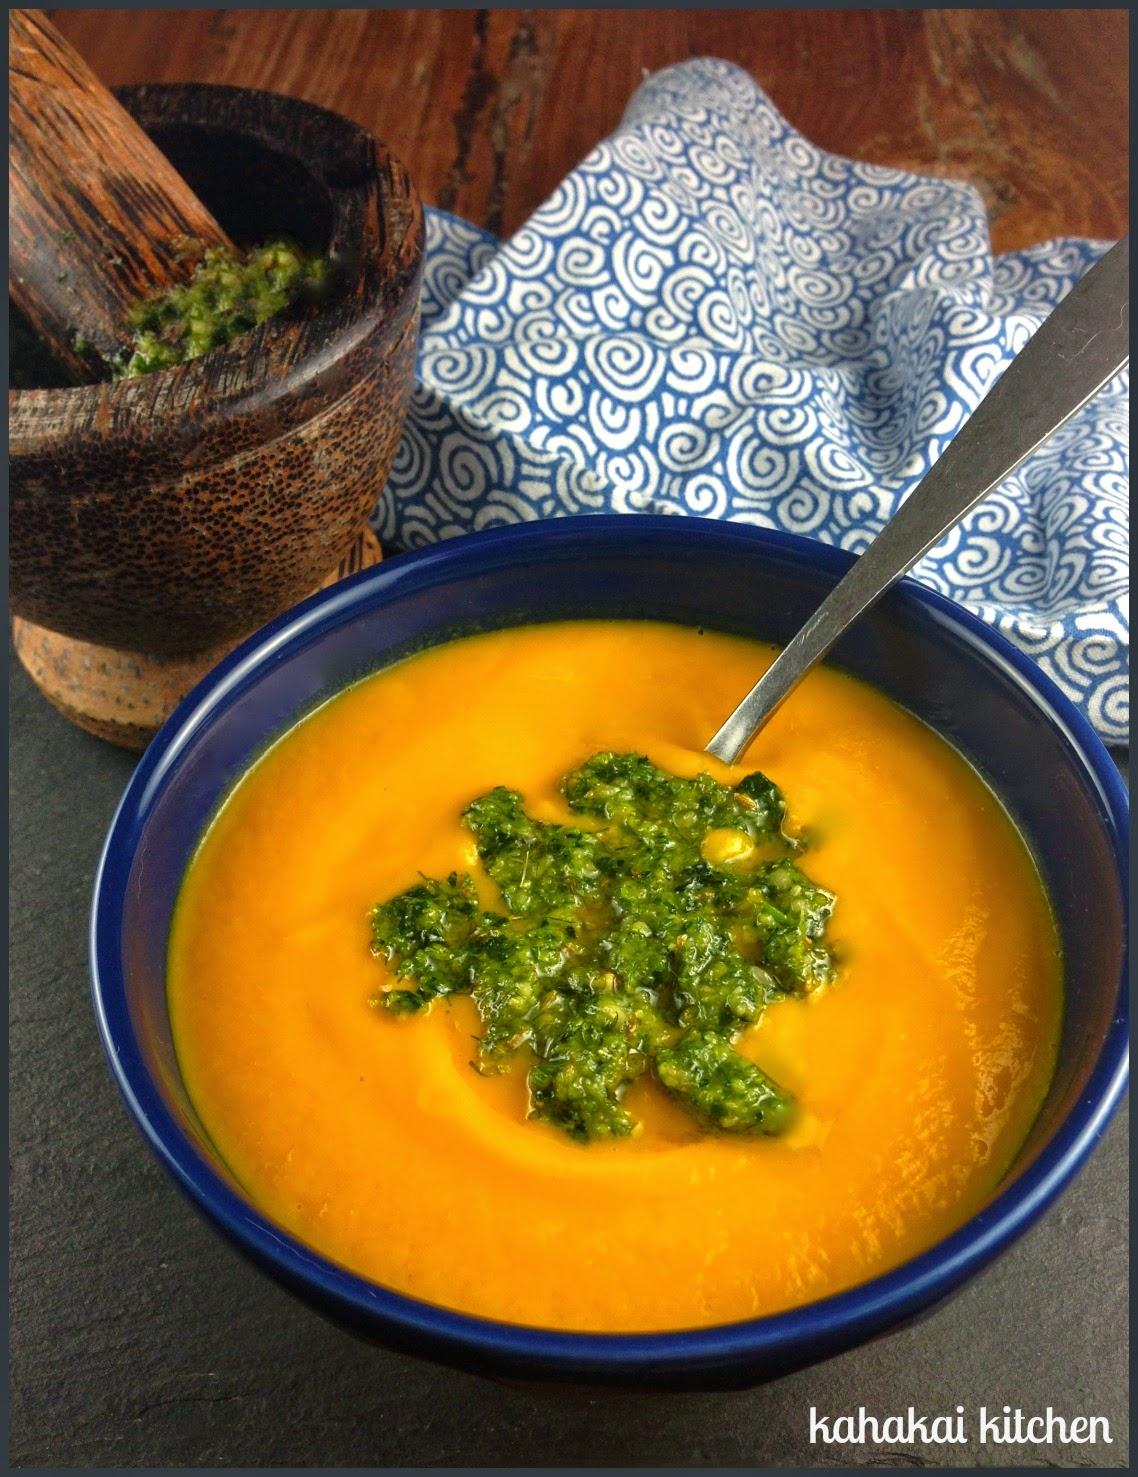 Kahakai Kitchen: Creamy Carrot Soup with Fennel Pesto for Souper (Soup ...